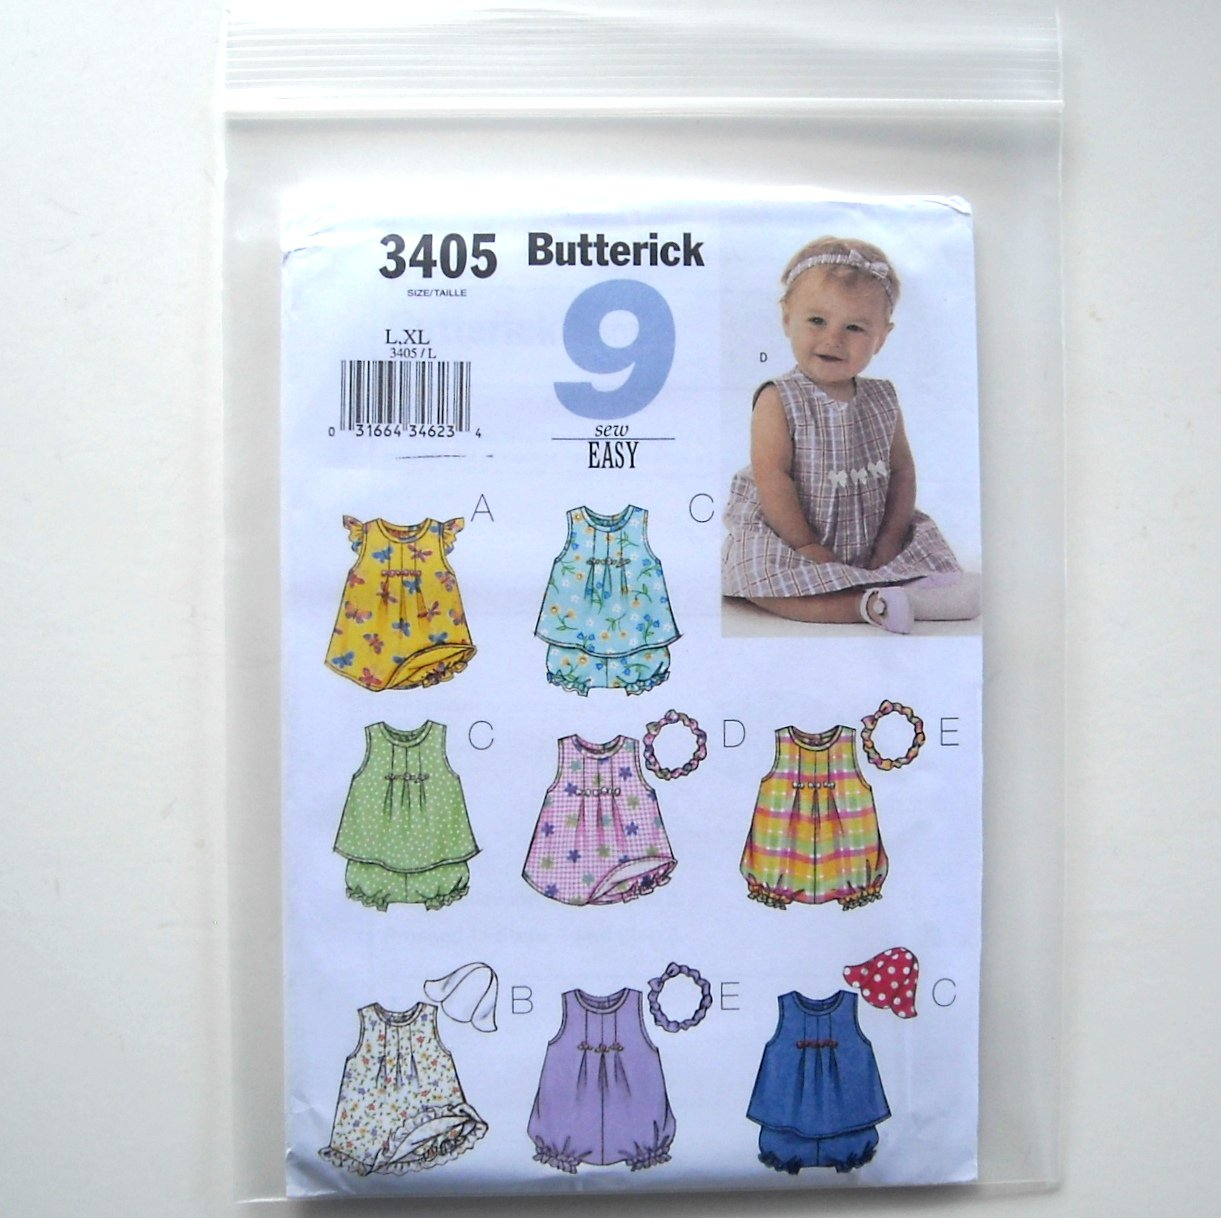 9 Easy Infants Dress Top Romper Panties Hat Headband Size L  XL Butterick Pattern B3405